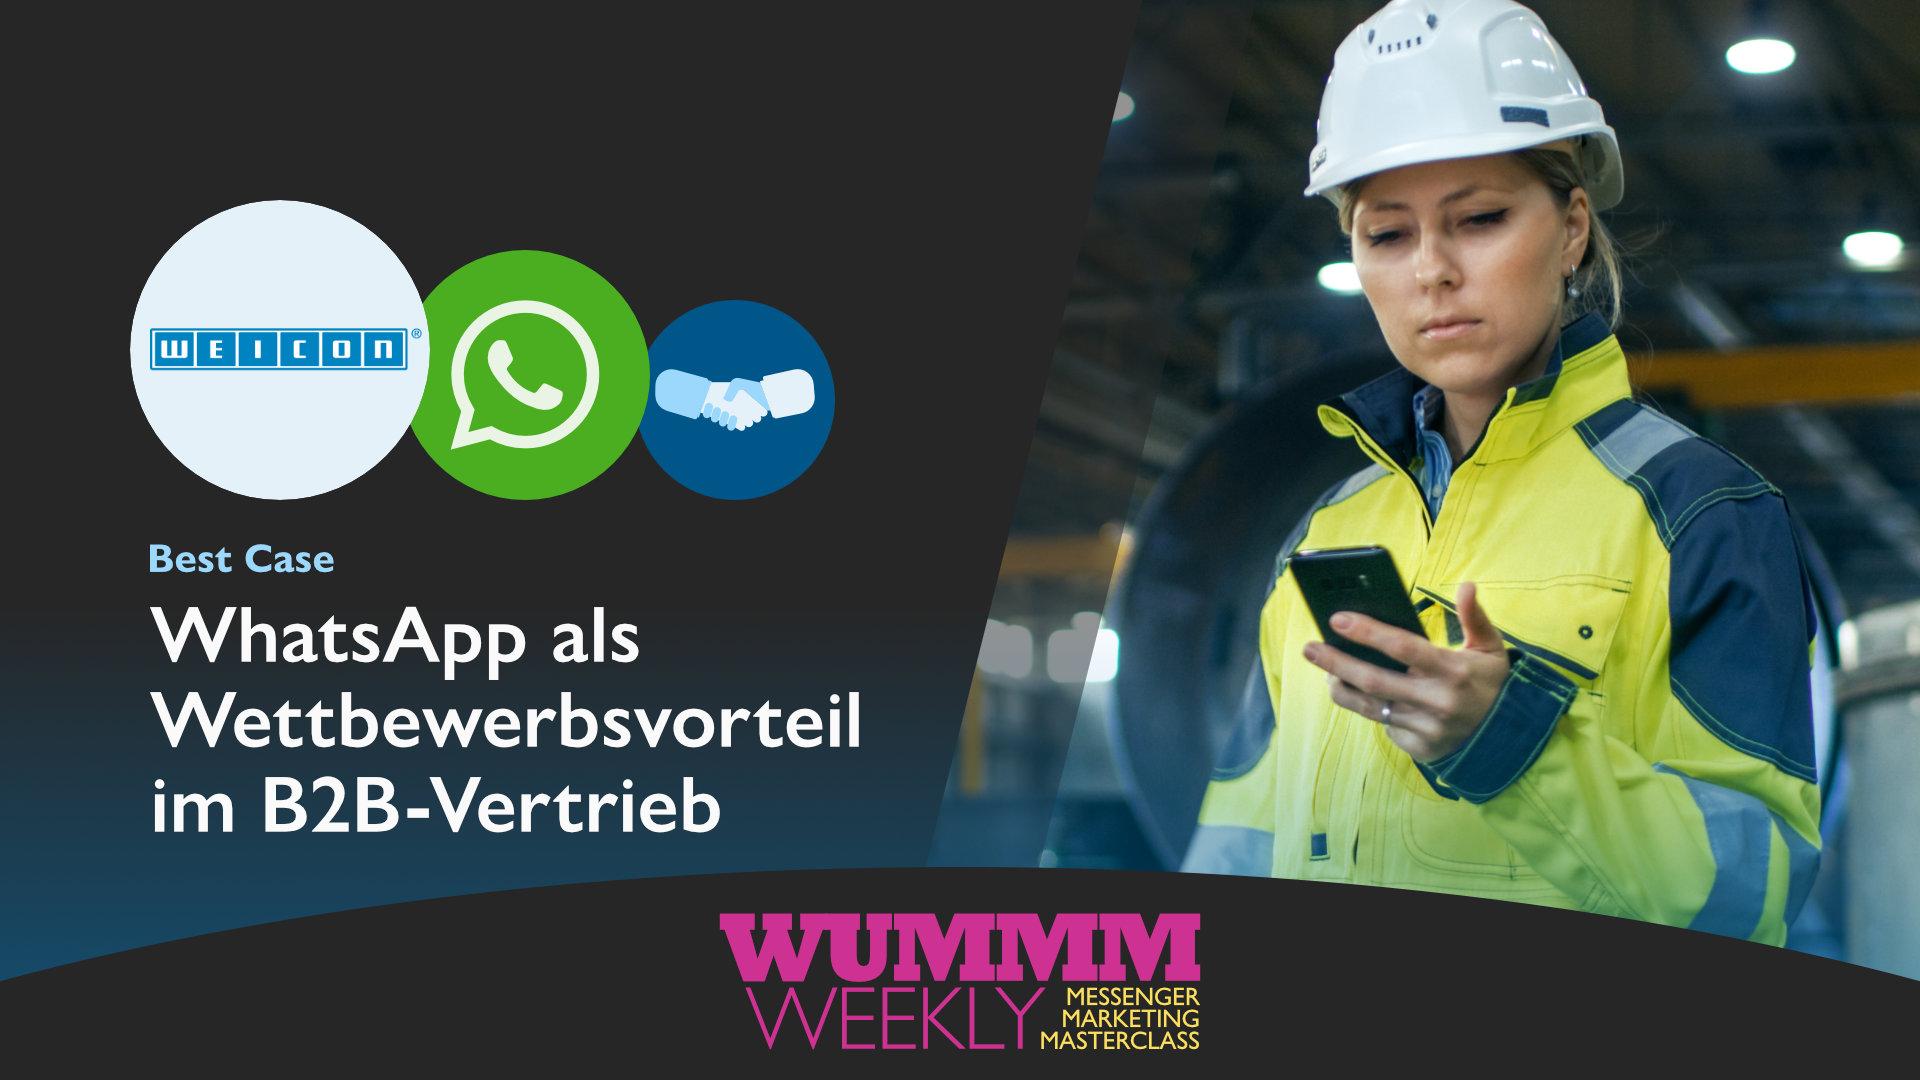 Wummm-weekly, Logo WEICON, Logo WhatsApp, Best Case - WhatsApp im B2B